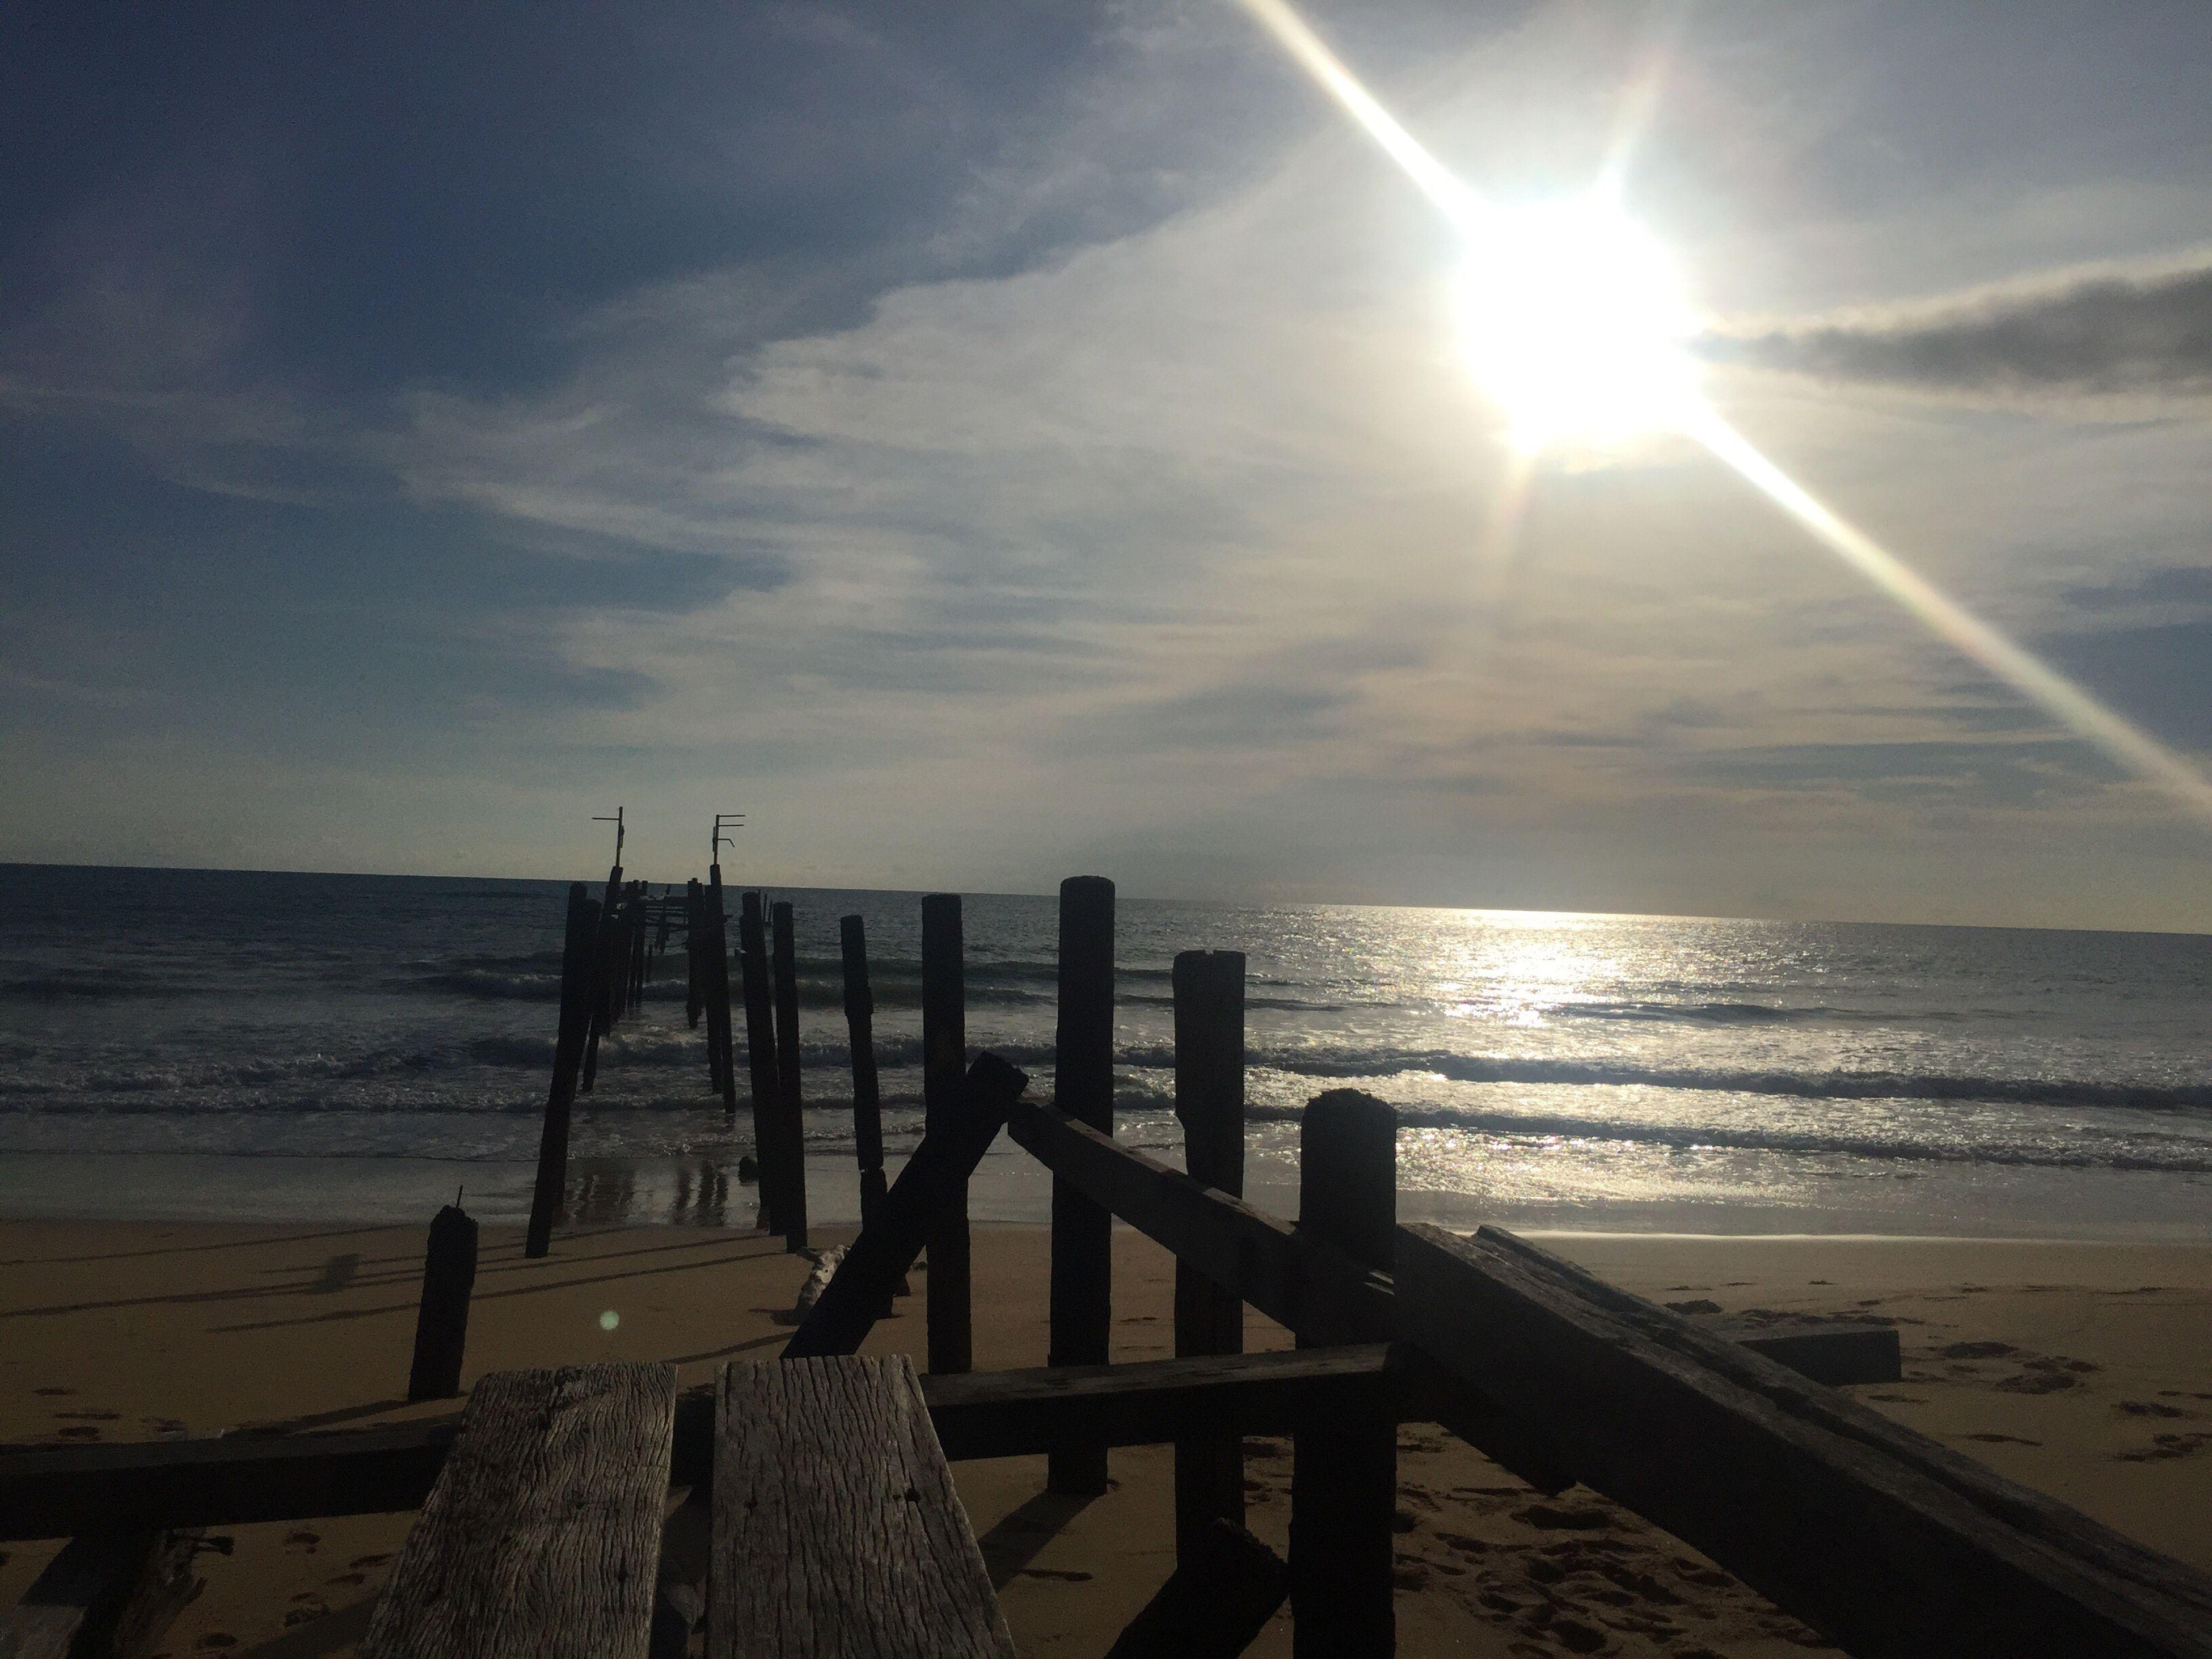 sea, horizon over water, sun, water, tranquil scene, scenics, sky, tranquility, sunlight, sunbeam, beauty in nature, shore, sunset, nature, pier, idyllic, lens flare, outdoors, sunny, remote, cloud - sky, calm, cloud, ocean, non-urban scene, bright, no people, seascape, coastline